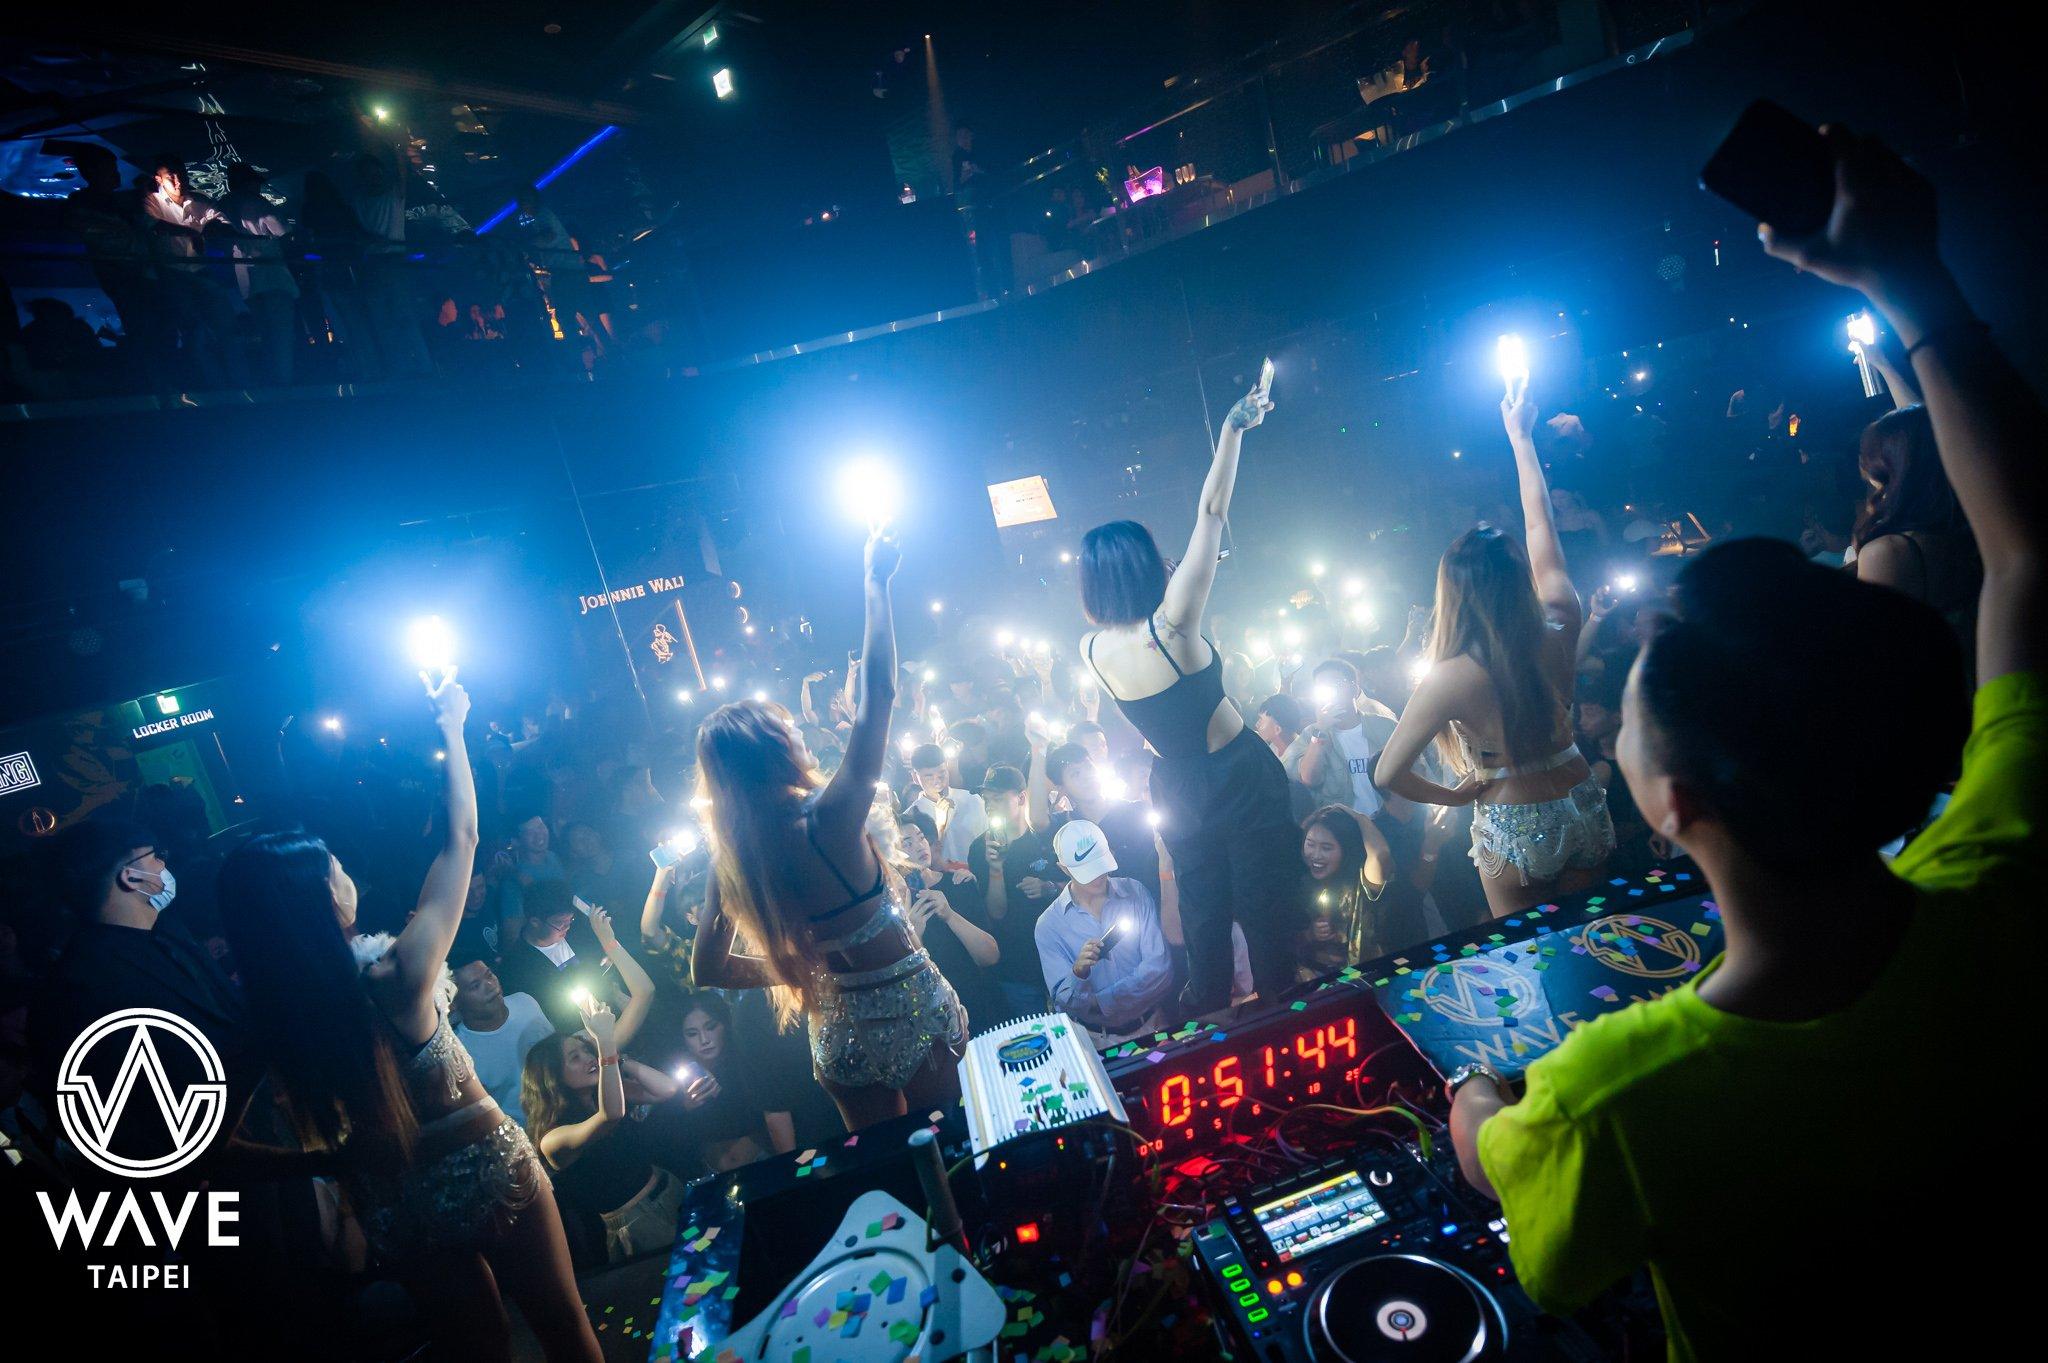 DJ, people and spotlight